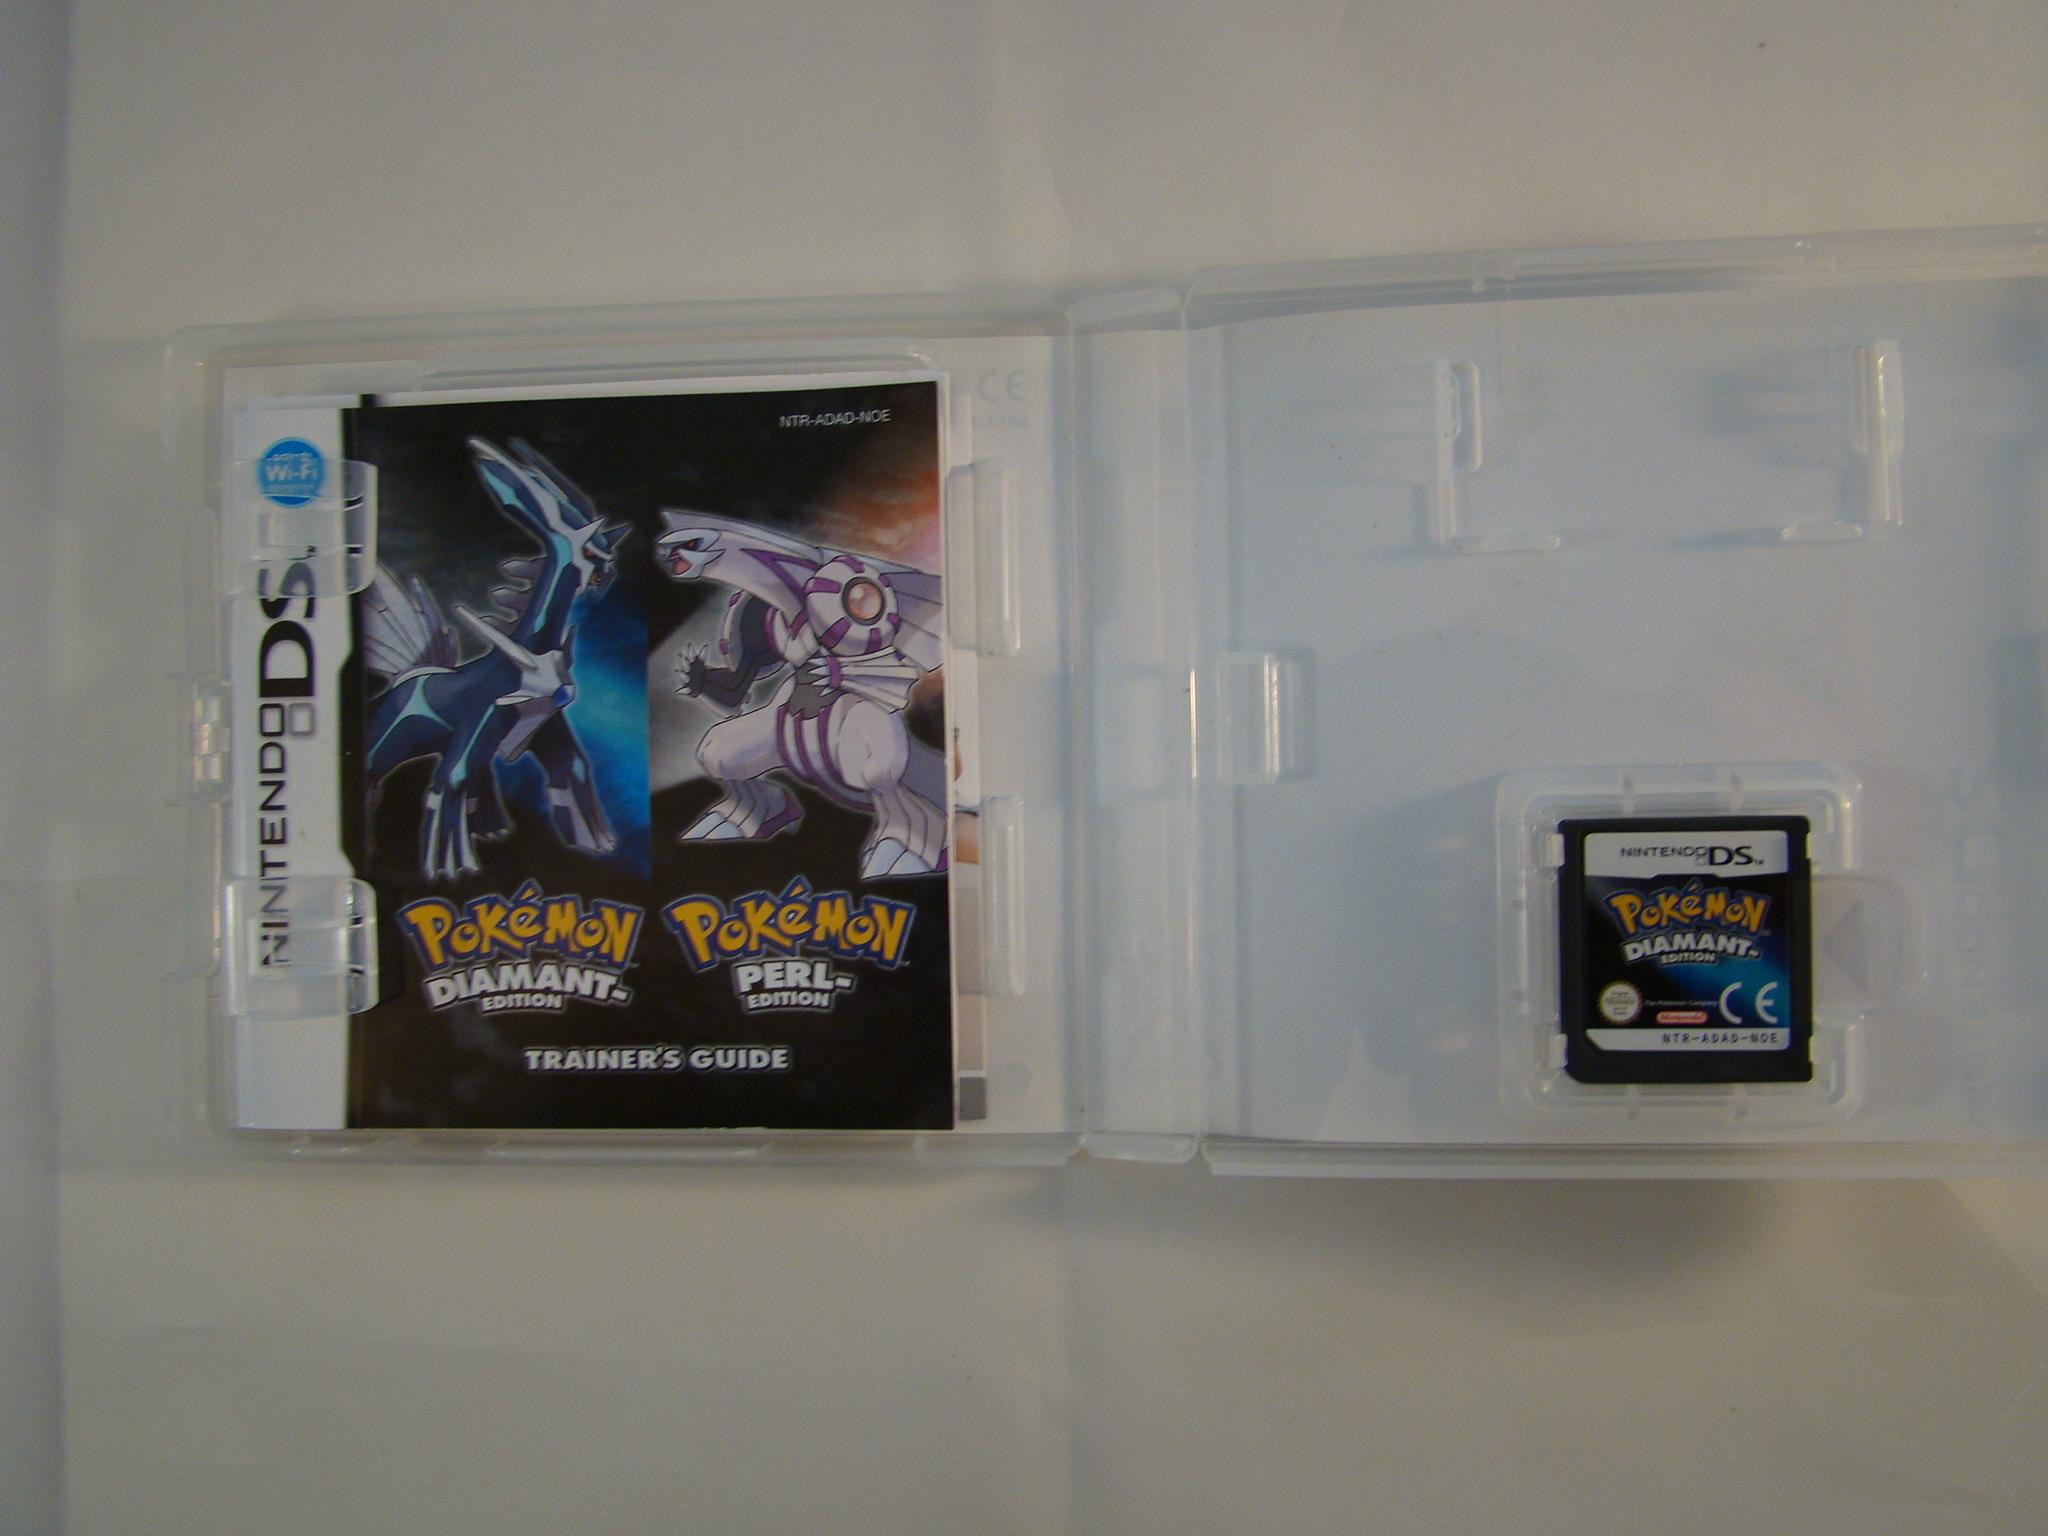 Pok mon diamant edition nds spel - Pokemon rare diamant ...